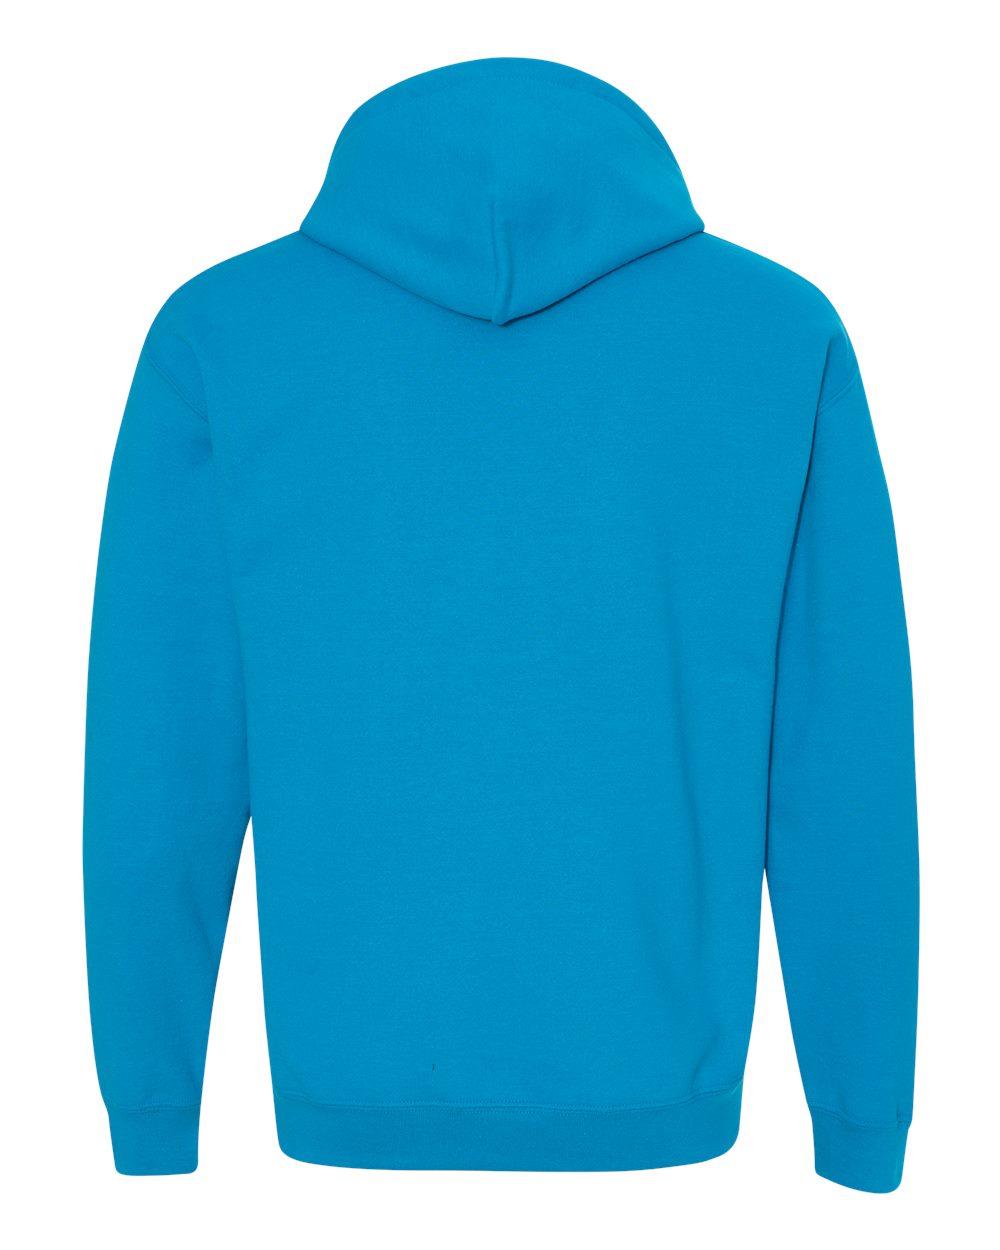 Gildan-Mens-Blank-Hoodie-Heavy-Blend-Hooded-Sweatshirt-Solid-18500-up-to-5XL thumbnail 93